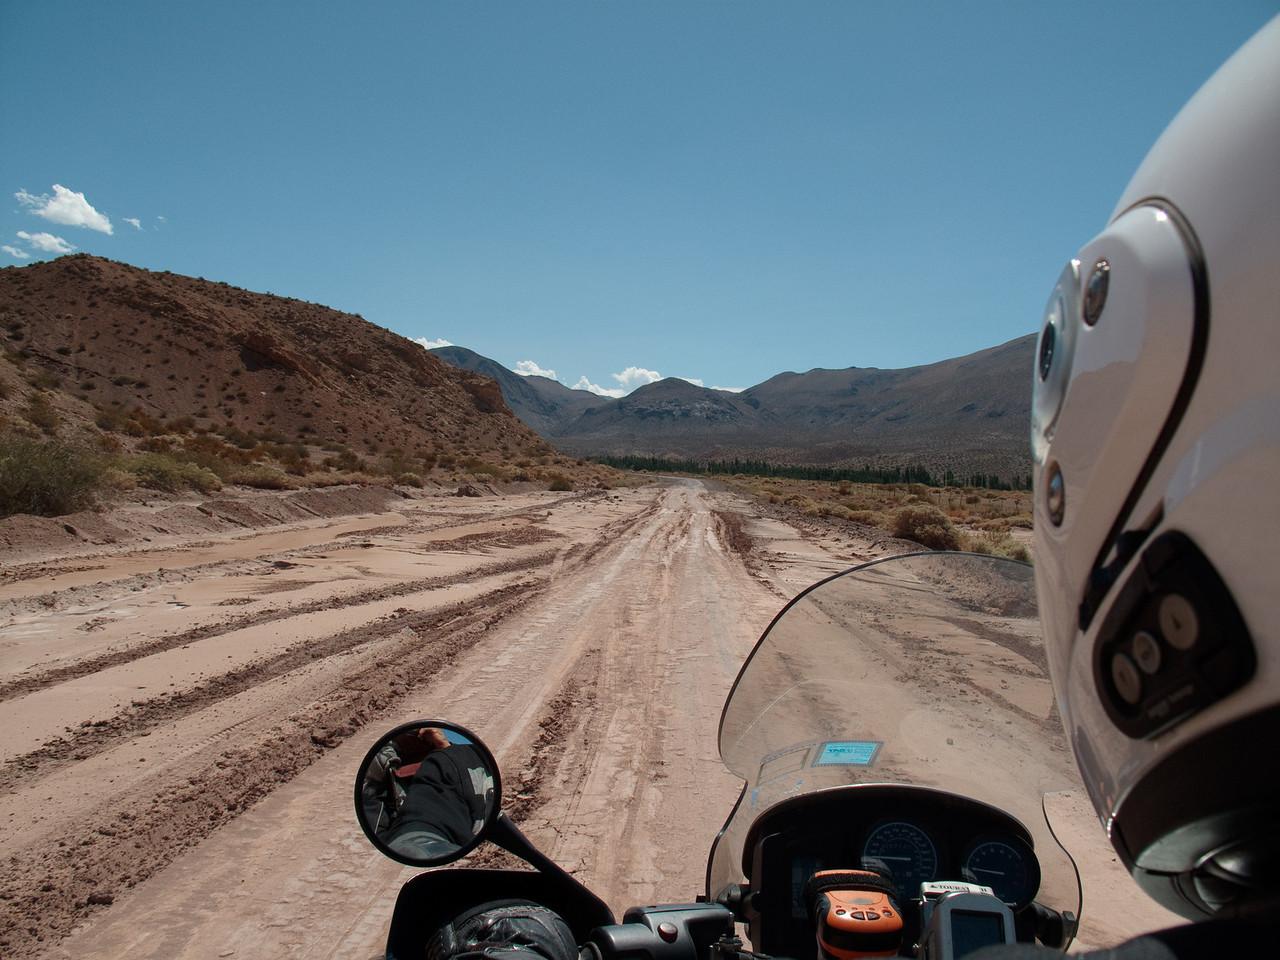 Road mud